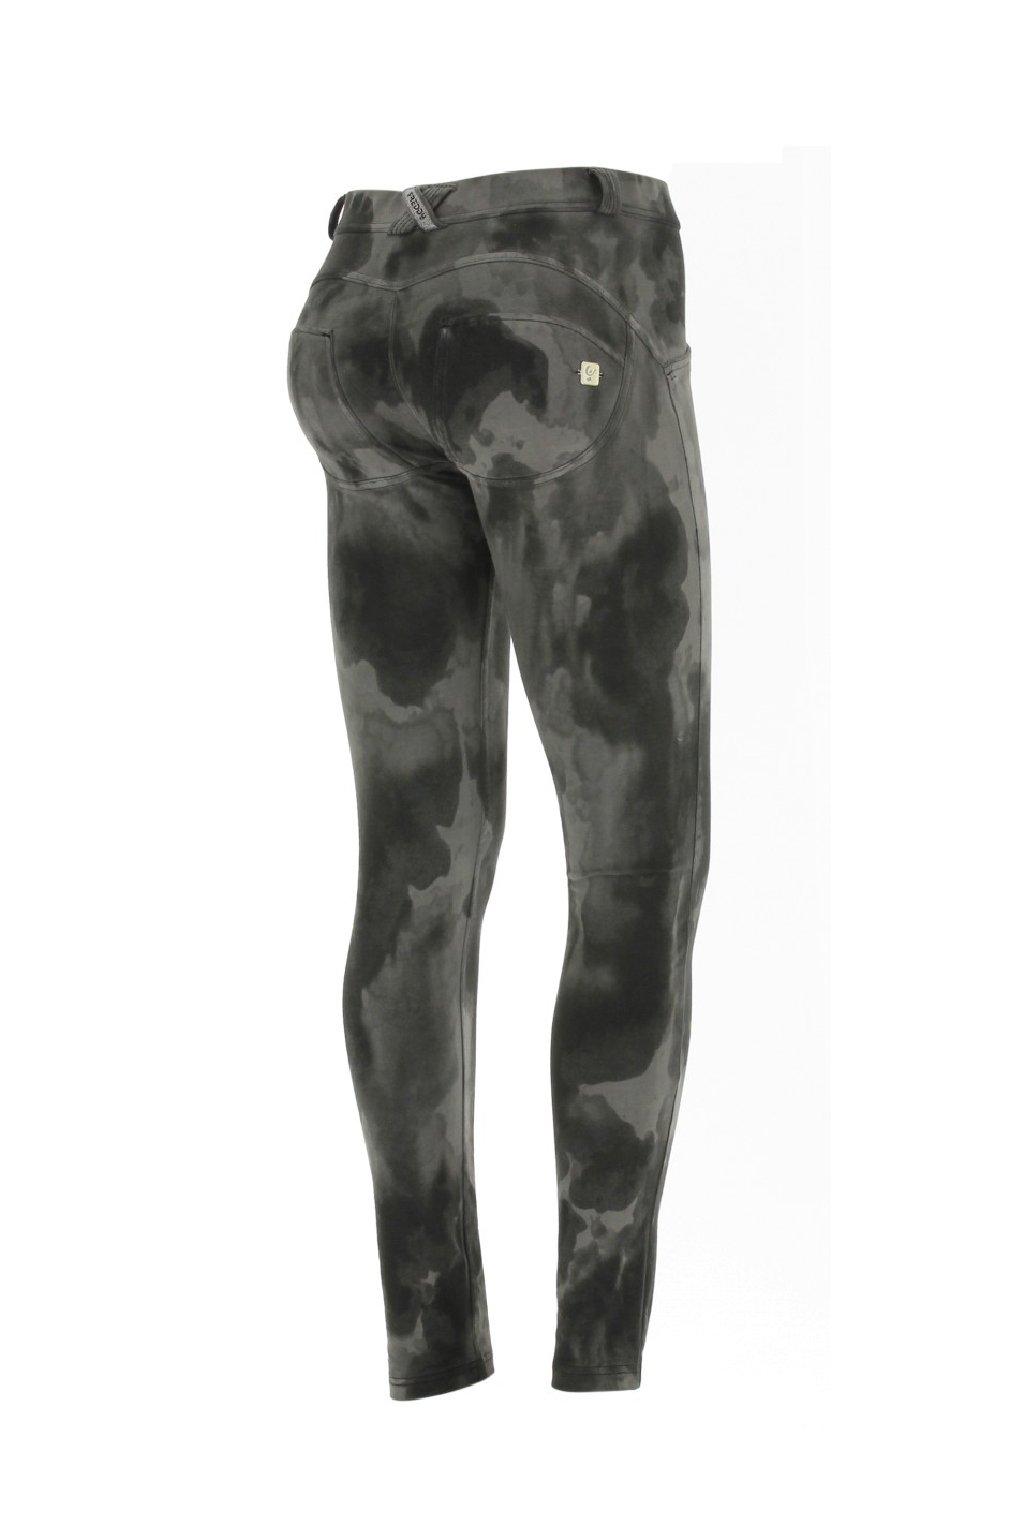 Freddy kalhoty skinny push up elasticke camouflage maskacove cerne sede normalni pas superskinny freddy originalni (4)